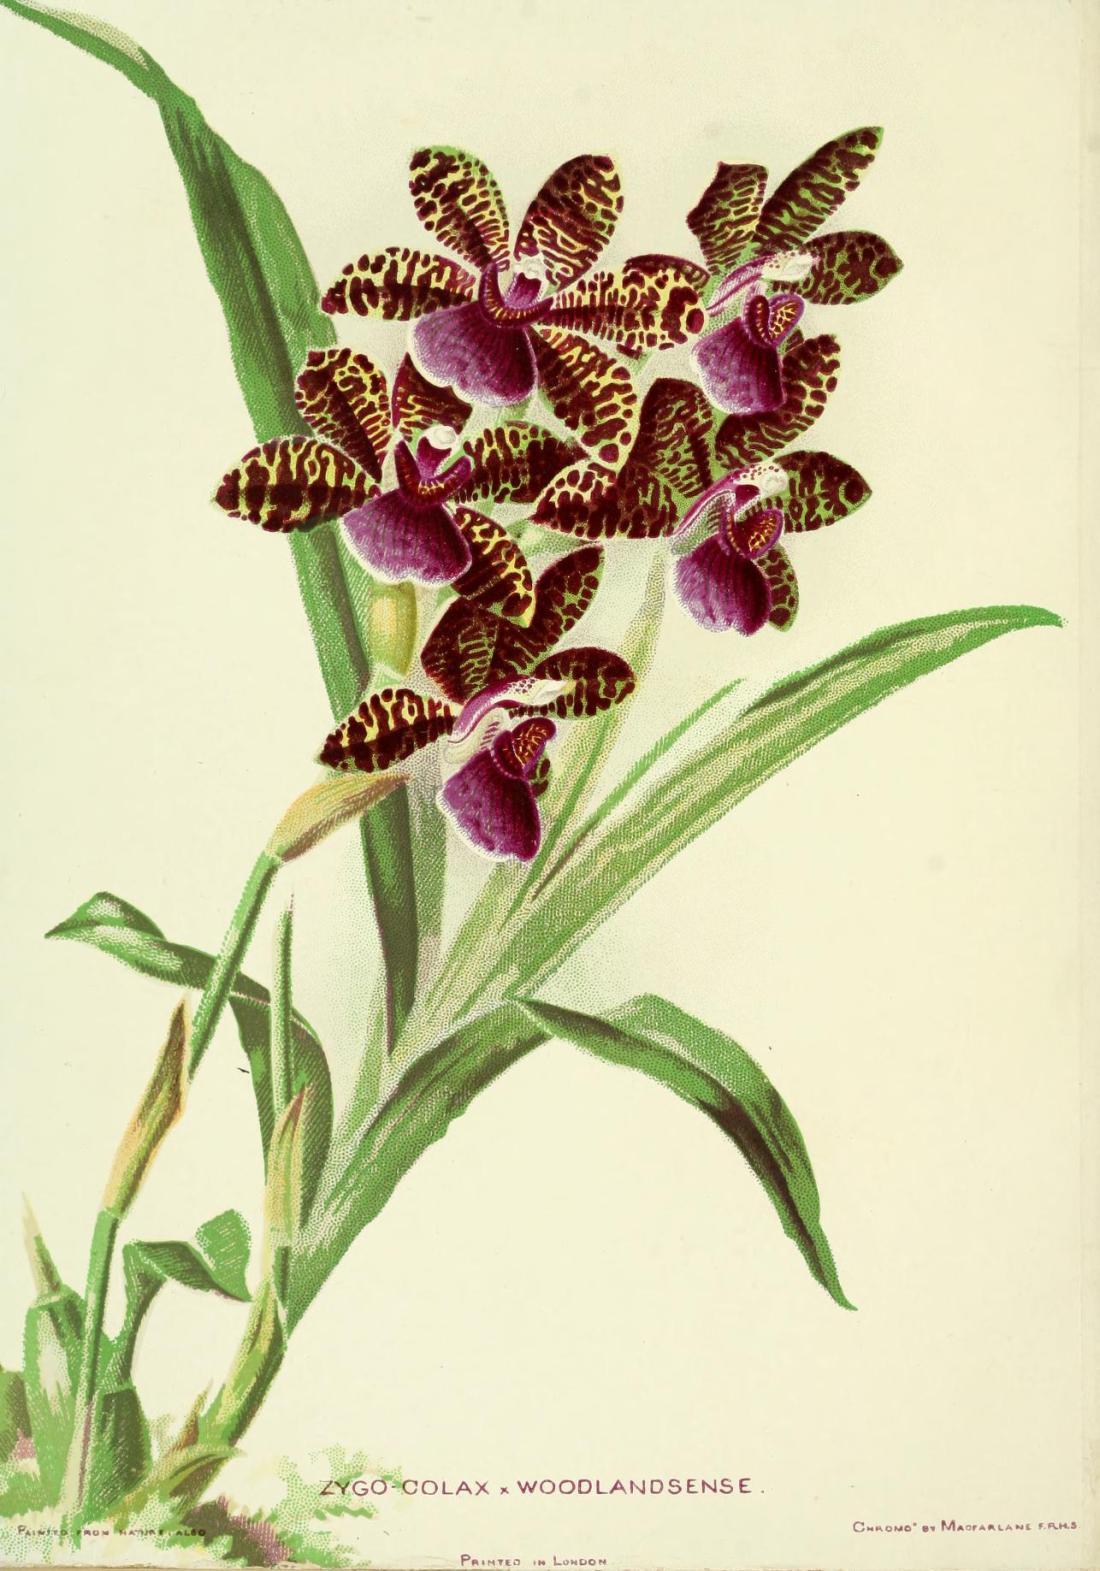 woodlandsorchids00boyl_0010